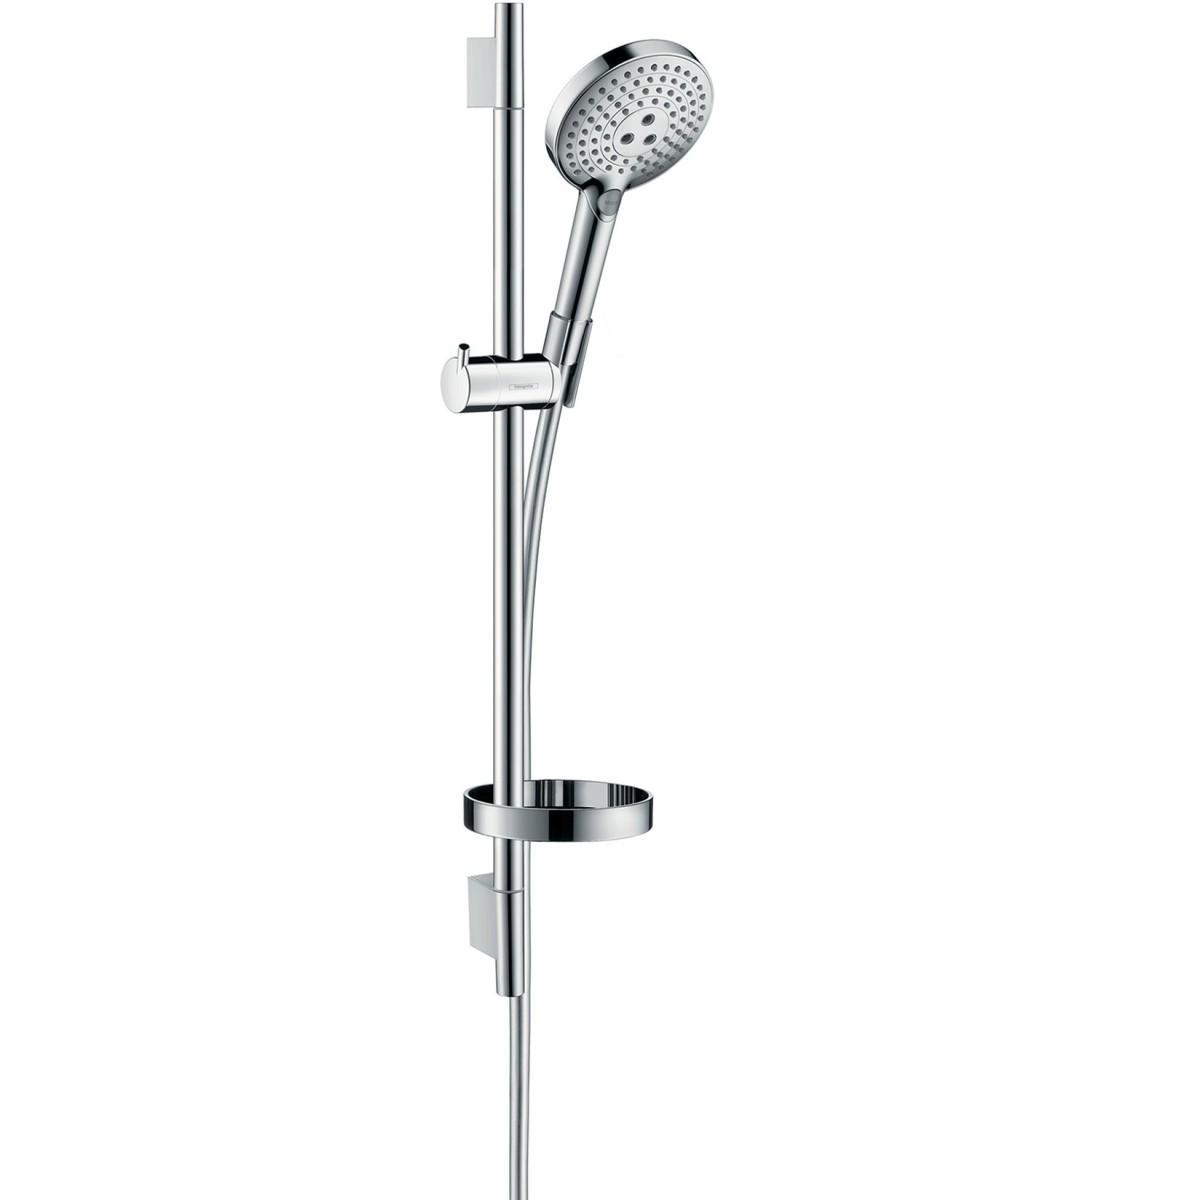 Душевая стойка Hansgrohe Raindance Select S120 65 см 3 режима